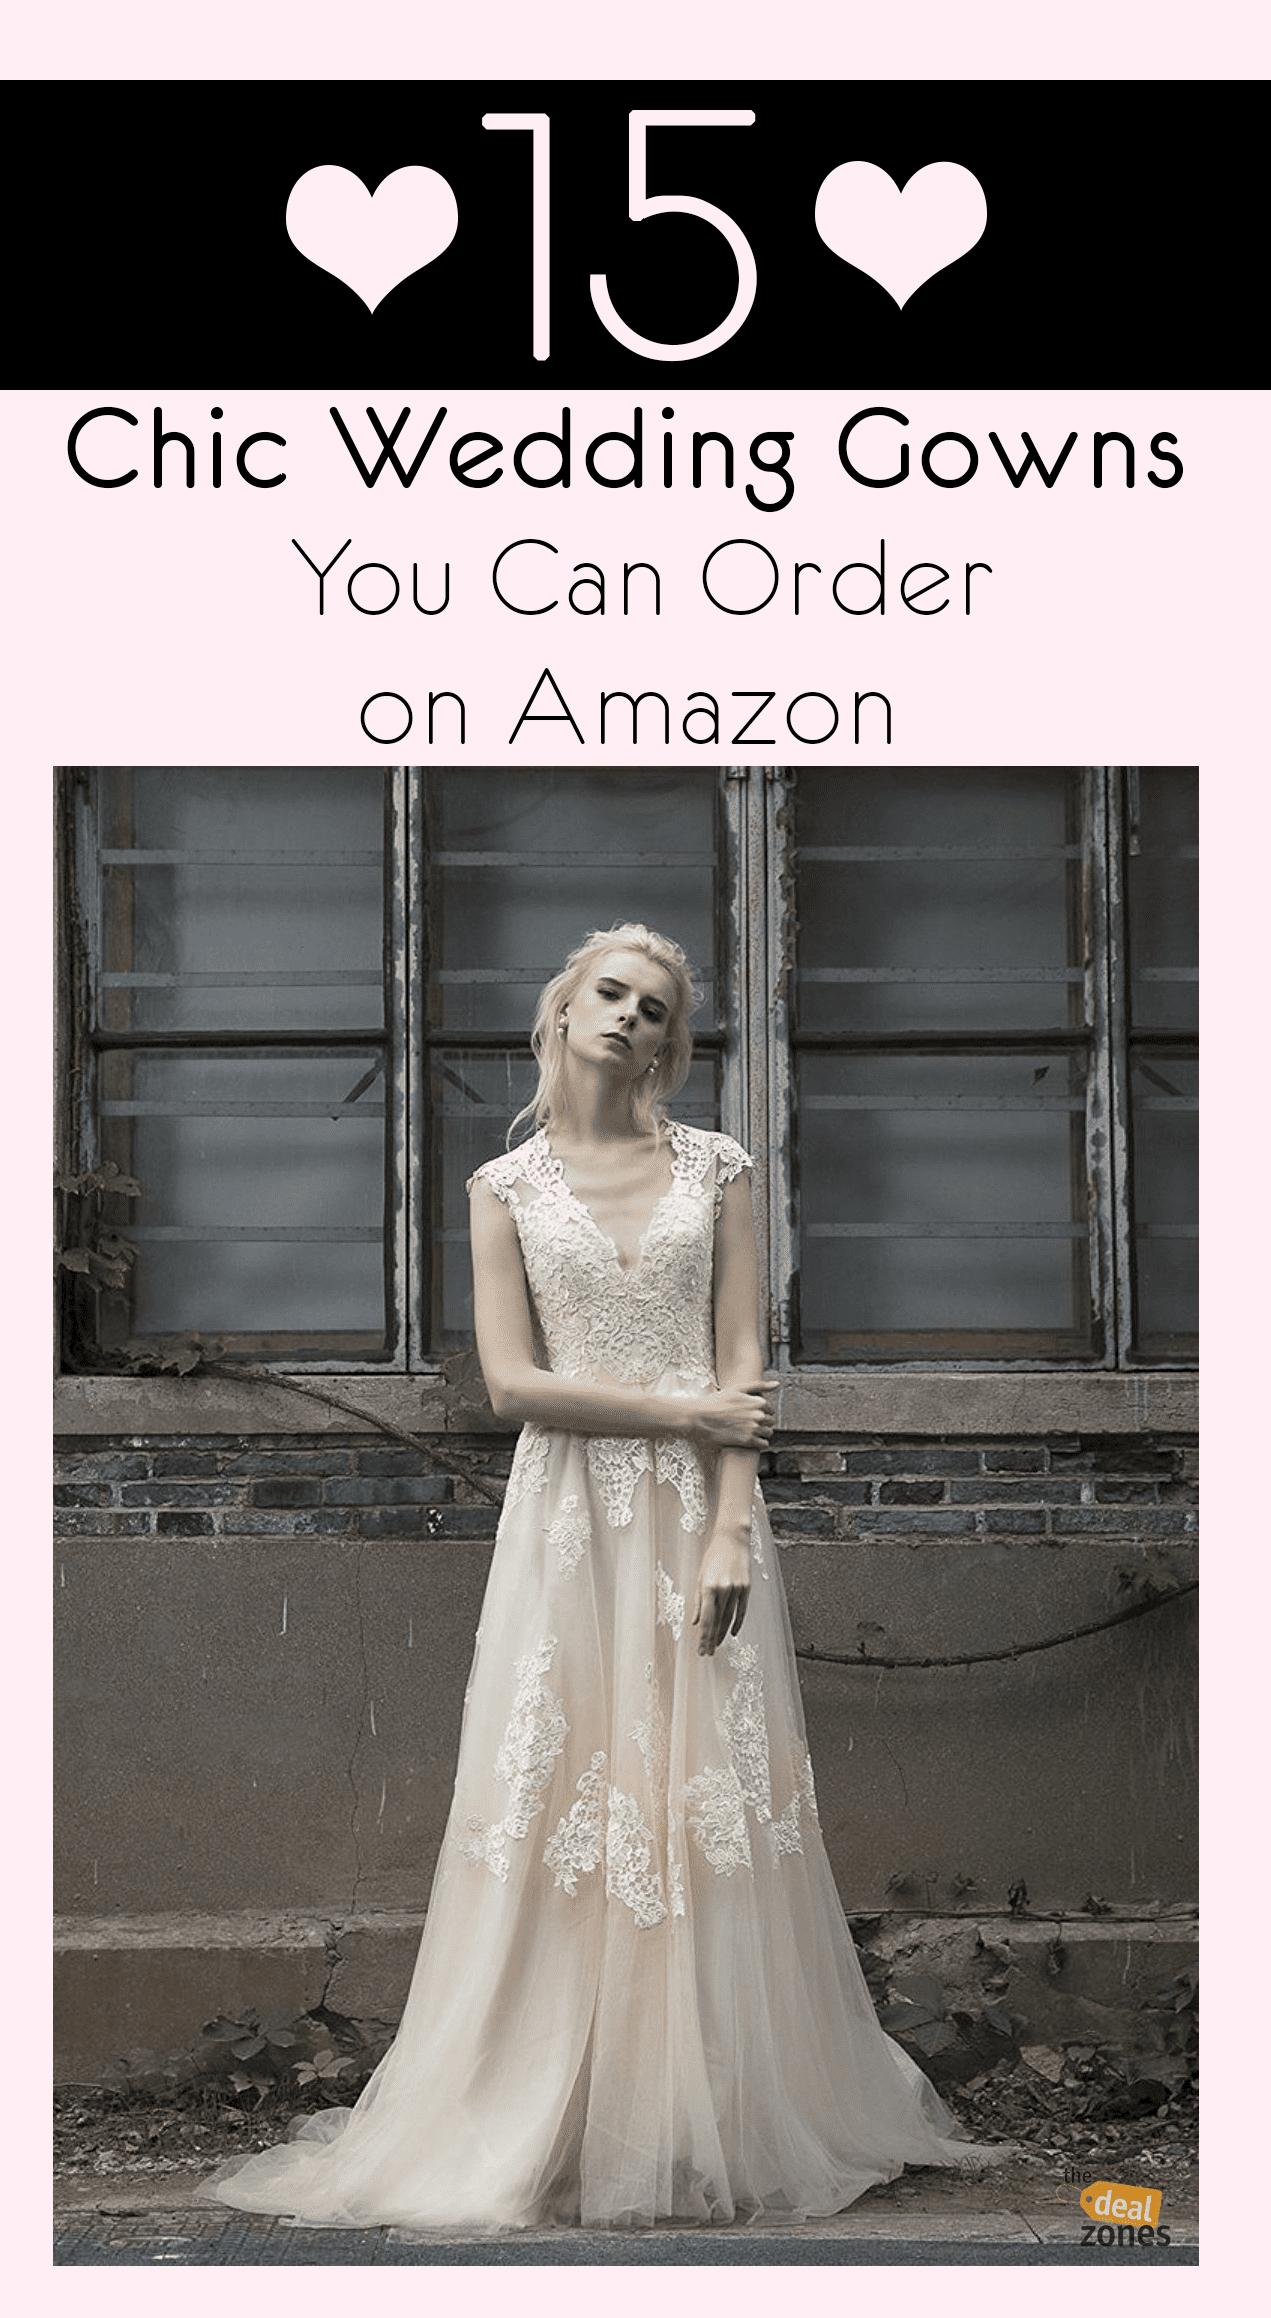 c47ac0d05274 Wedding Dresses Online Amazon - Aztec Stone and Reclamations